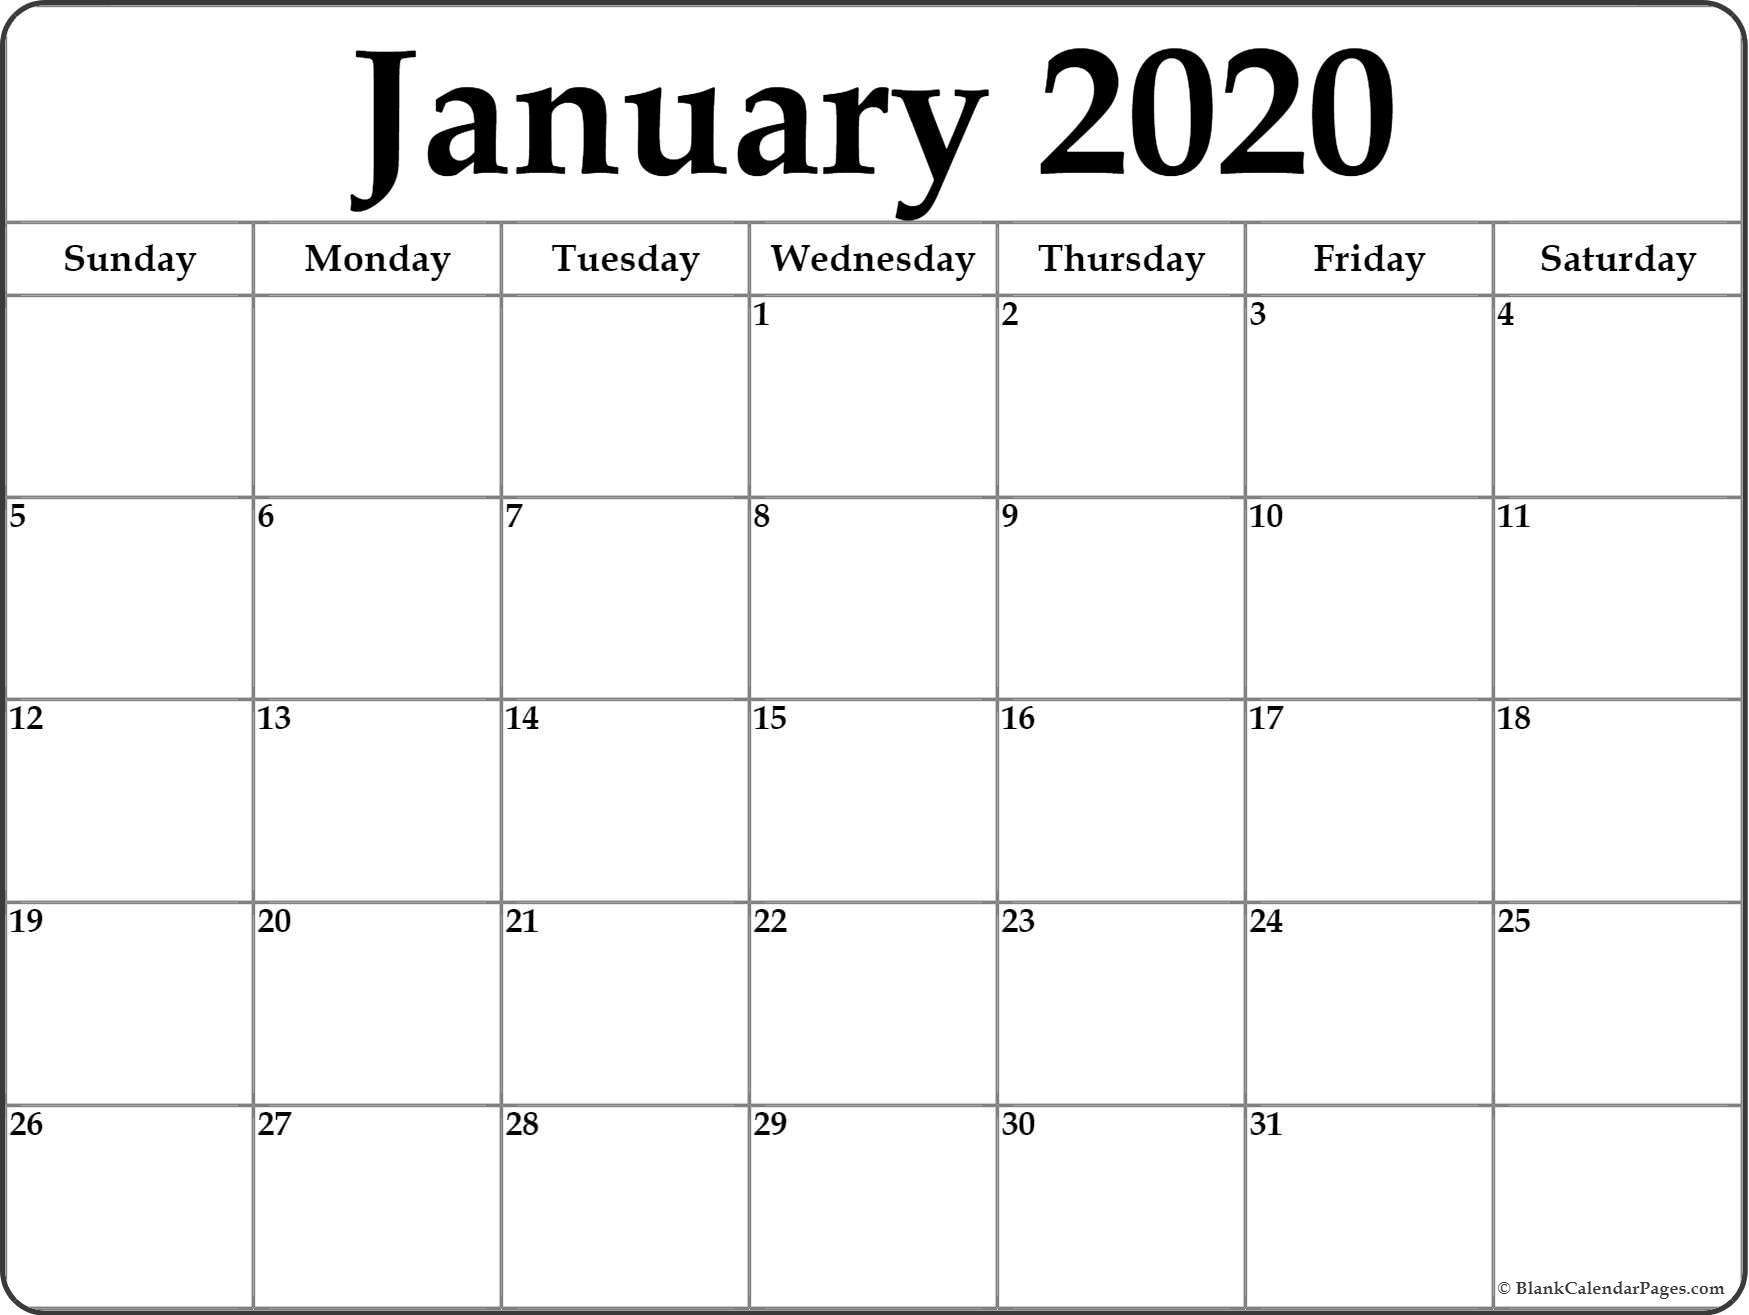 January 2020 Calendar | Free Printable Monthly Calendars-2020 Fill In Printable Monthly Calendar